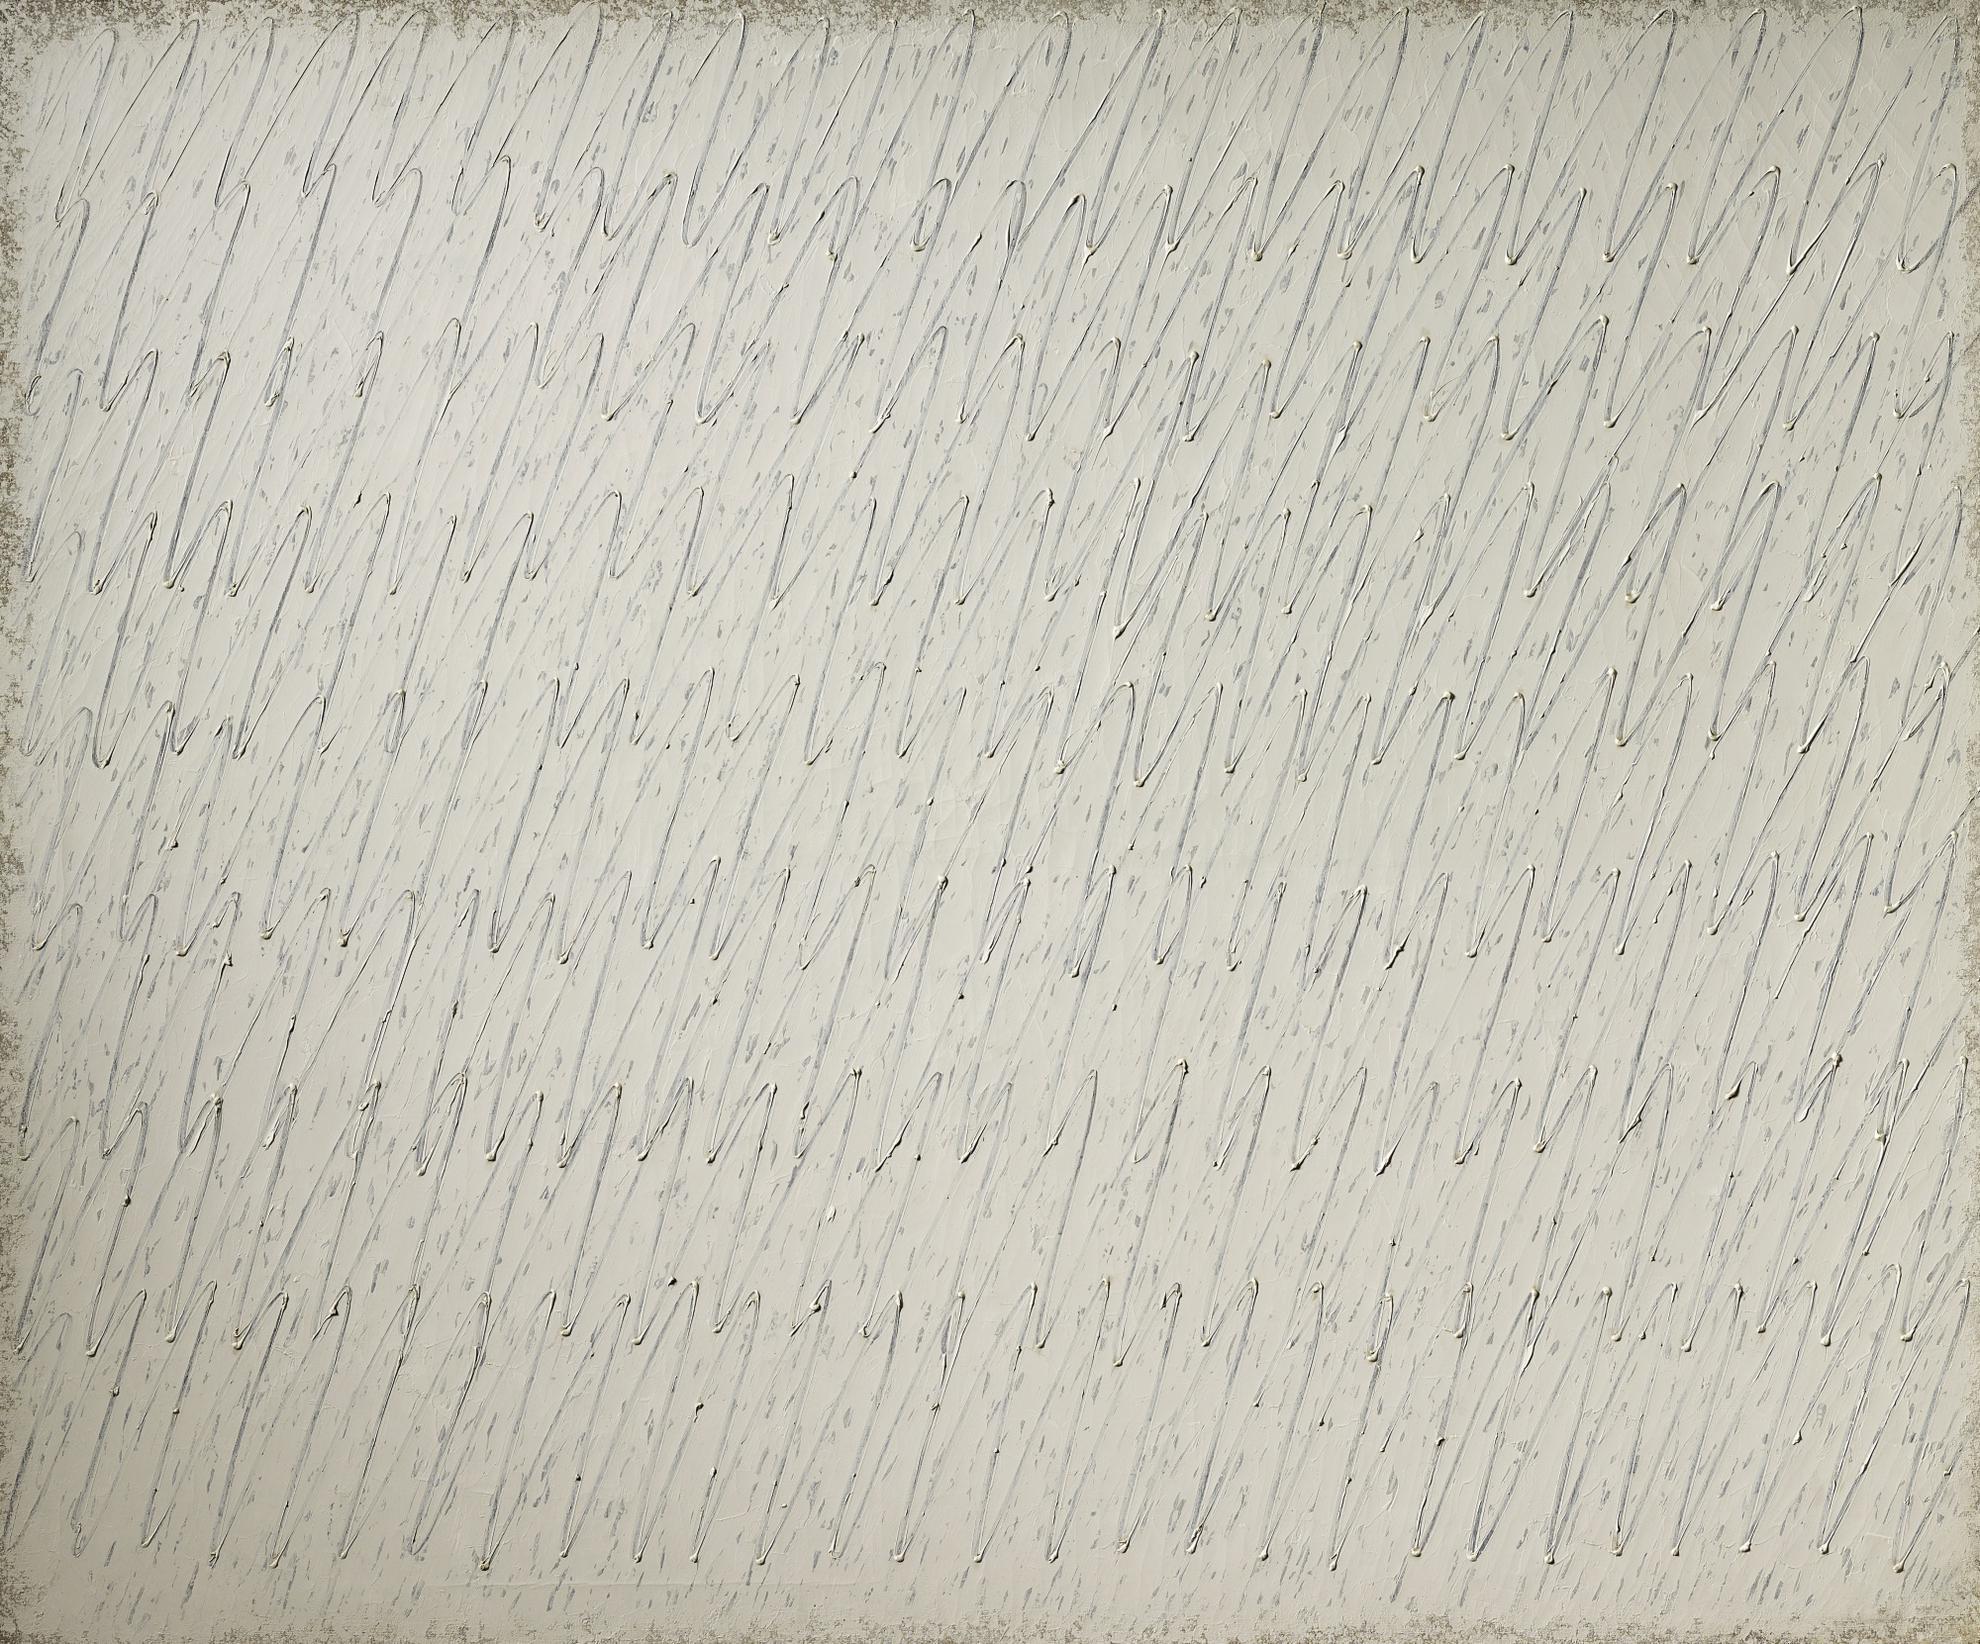 Park Seo-bo-Ecriture No. 5-80-1980